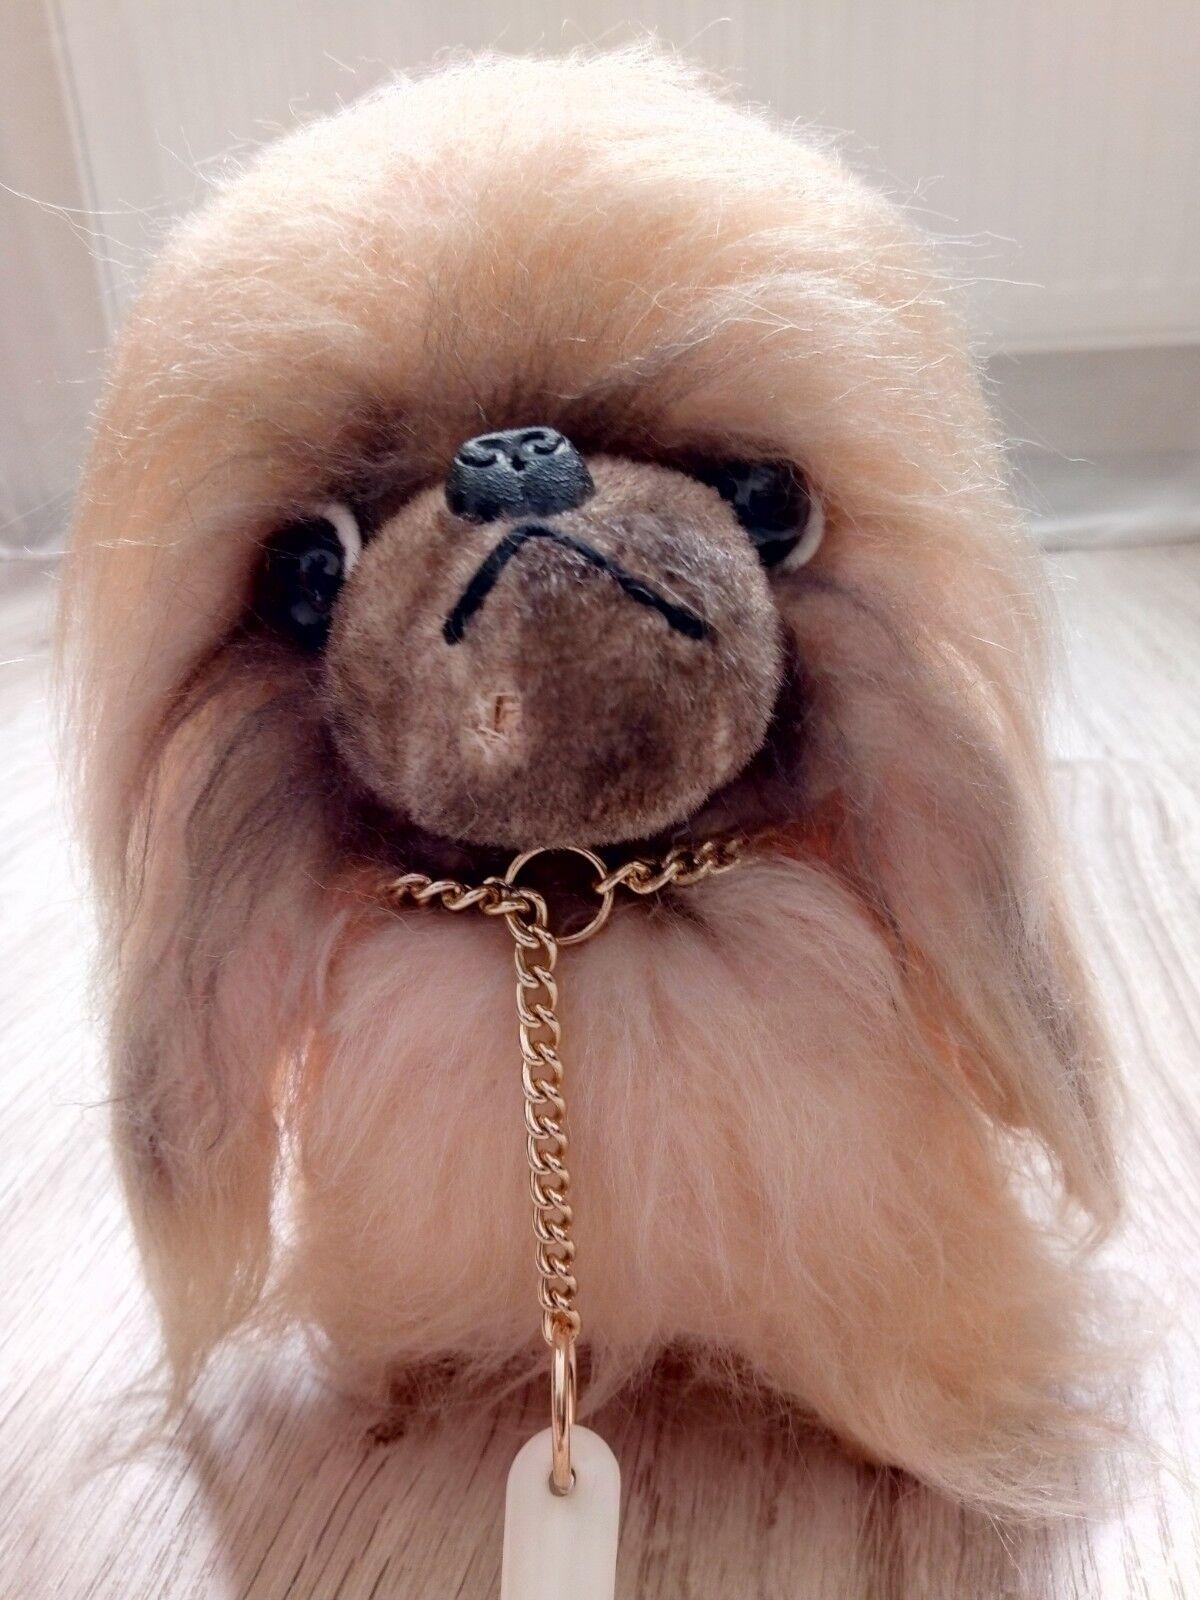 Cute Vintage Jestia N.451 Stuffed Toy Doll - Dog Made In Japan Straw Filling